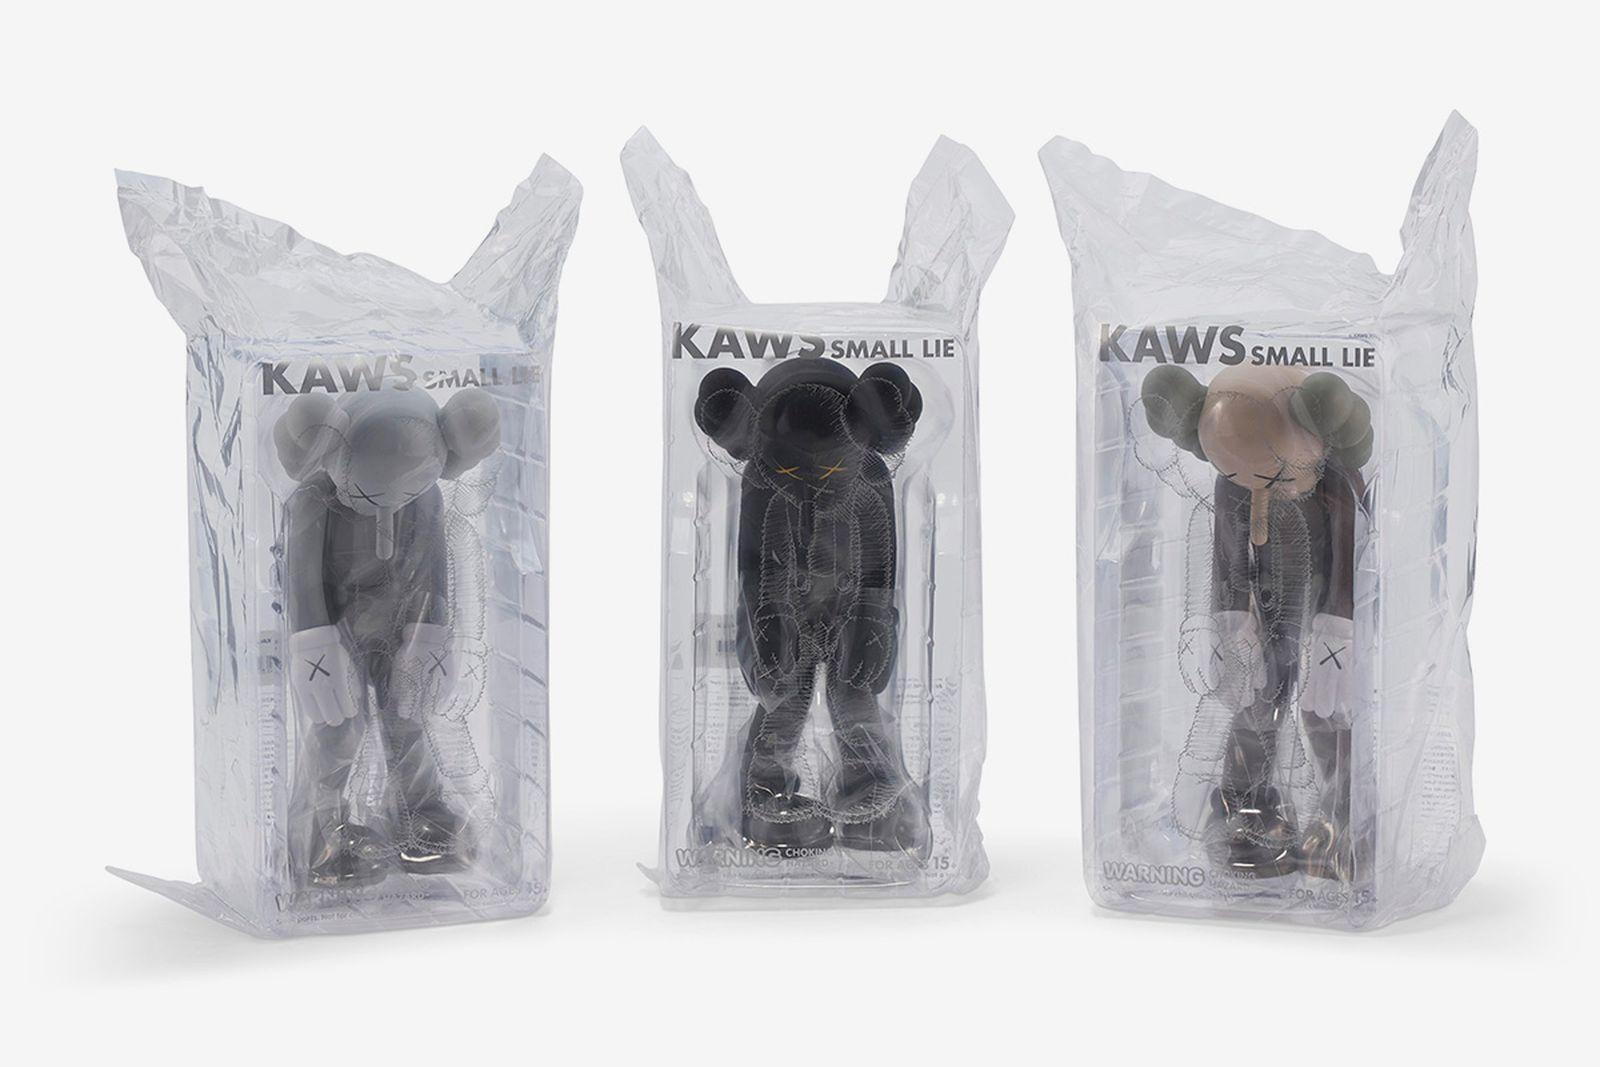 KAWS - Three works: (Small Lie Brown, Small Lie Black and Small Lie Gray)